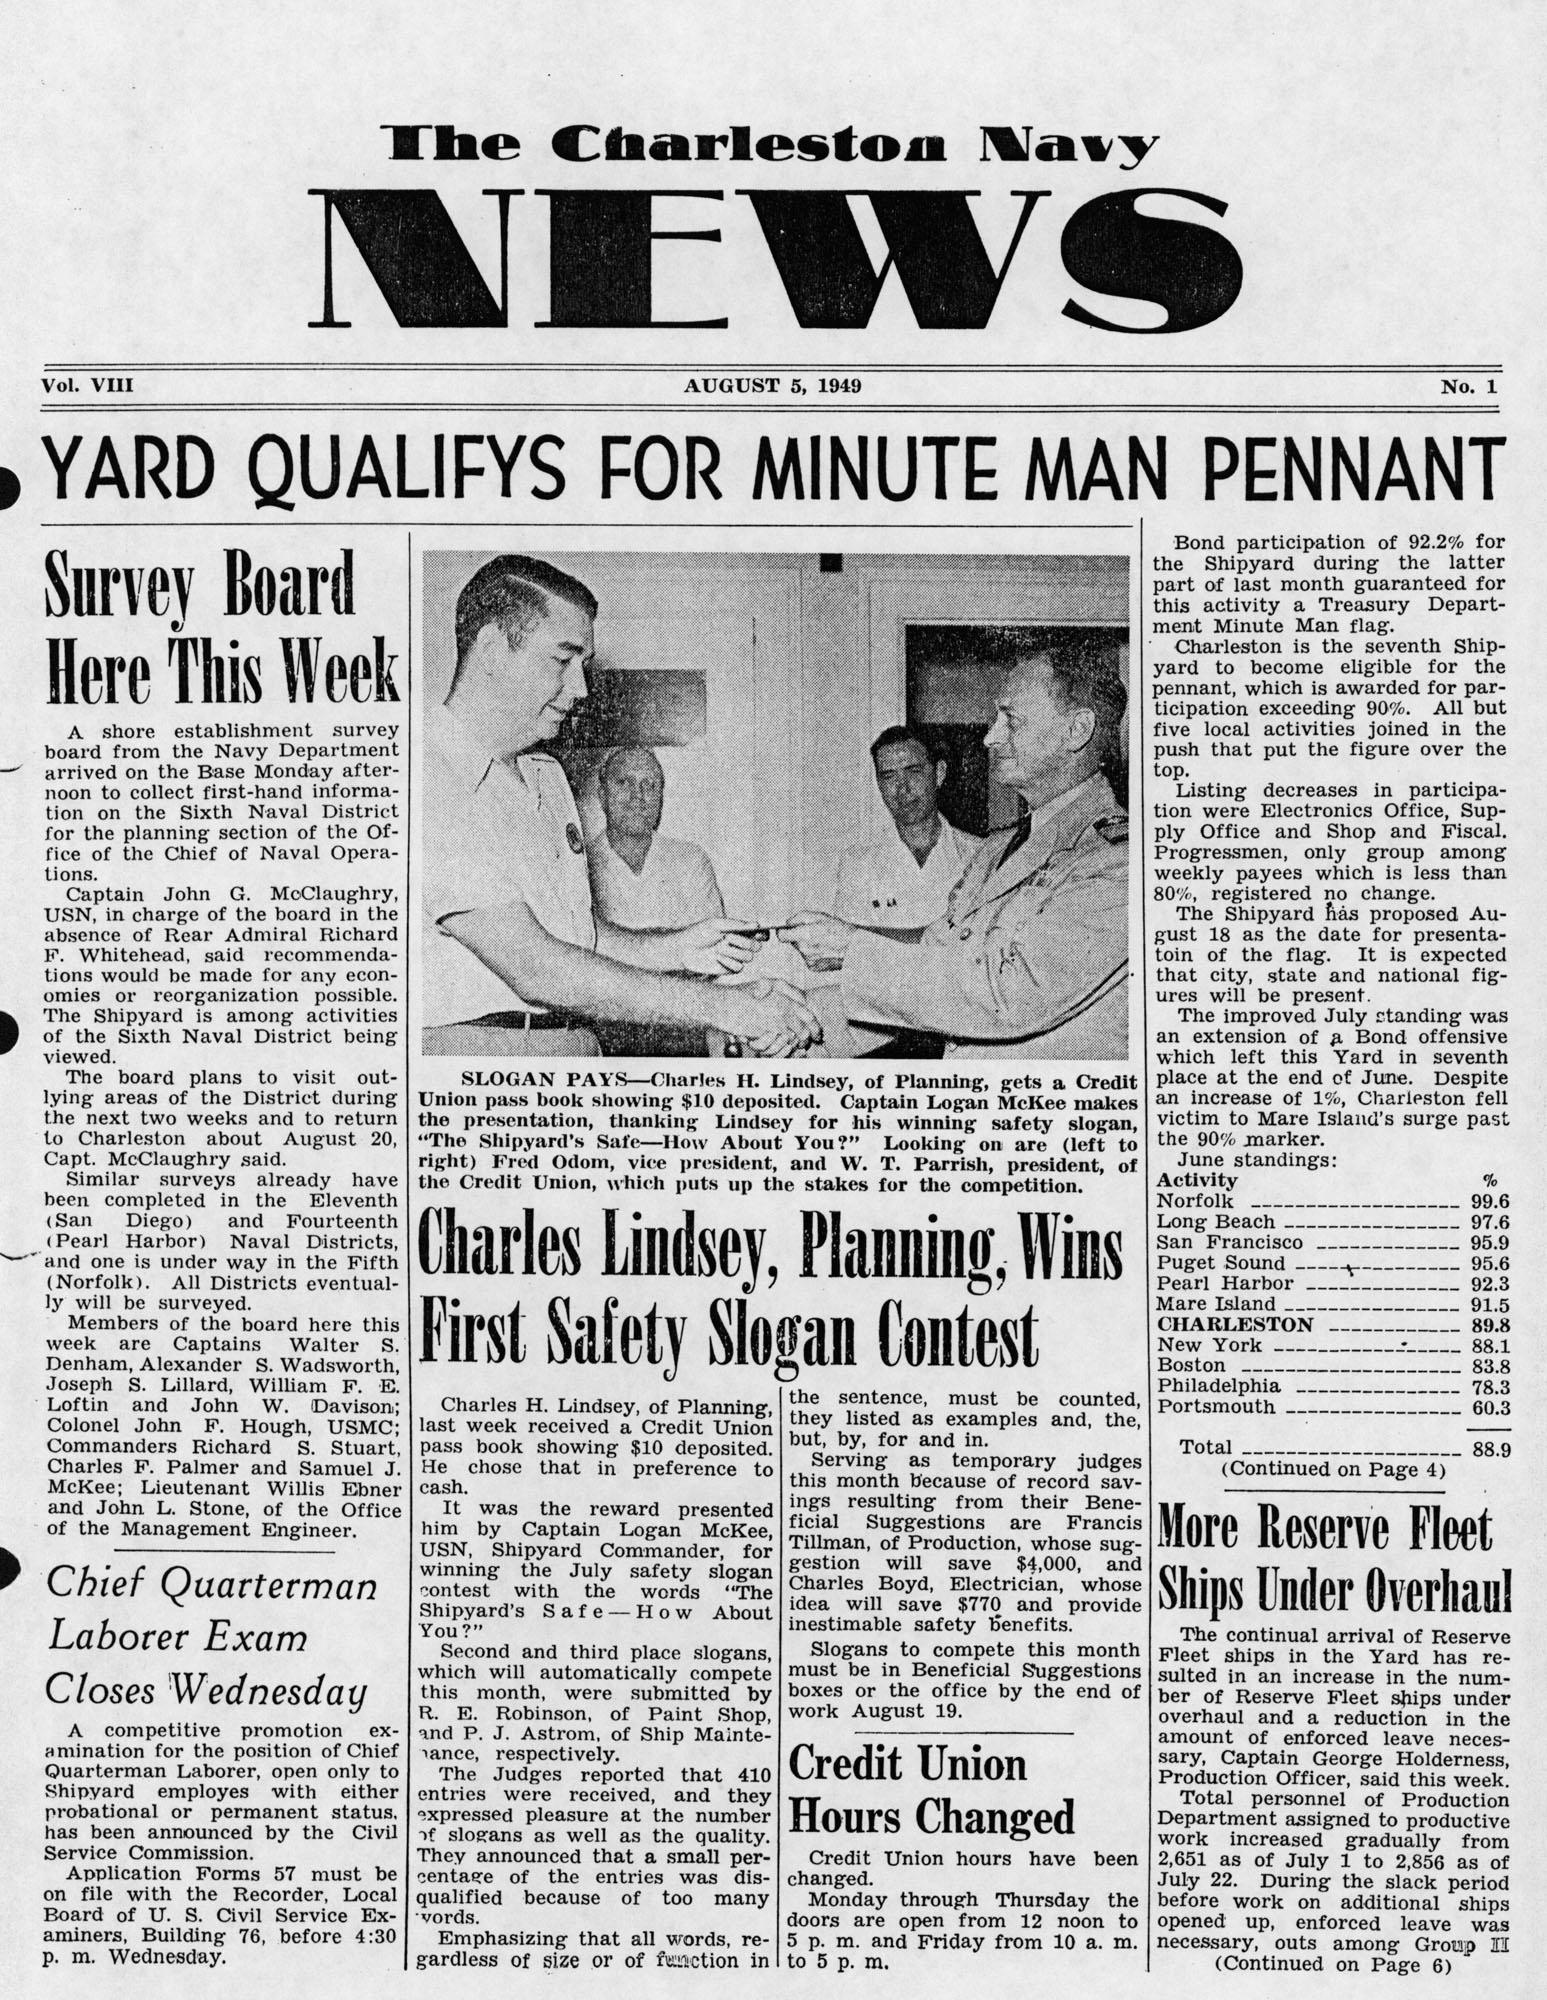 The Charleston Navy News, Volume 8, Edition 1, page i